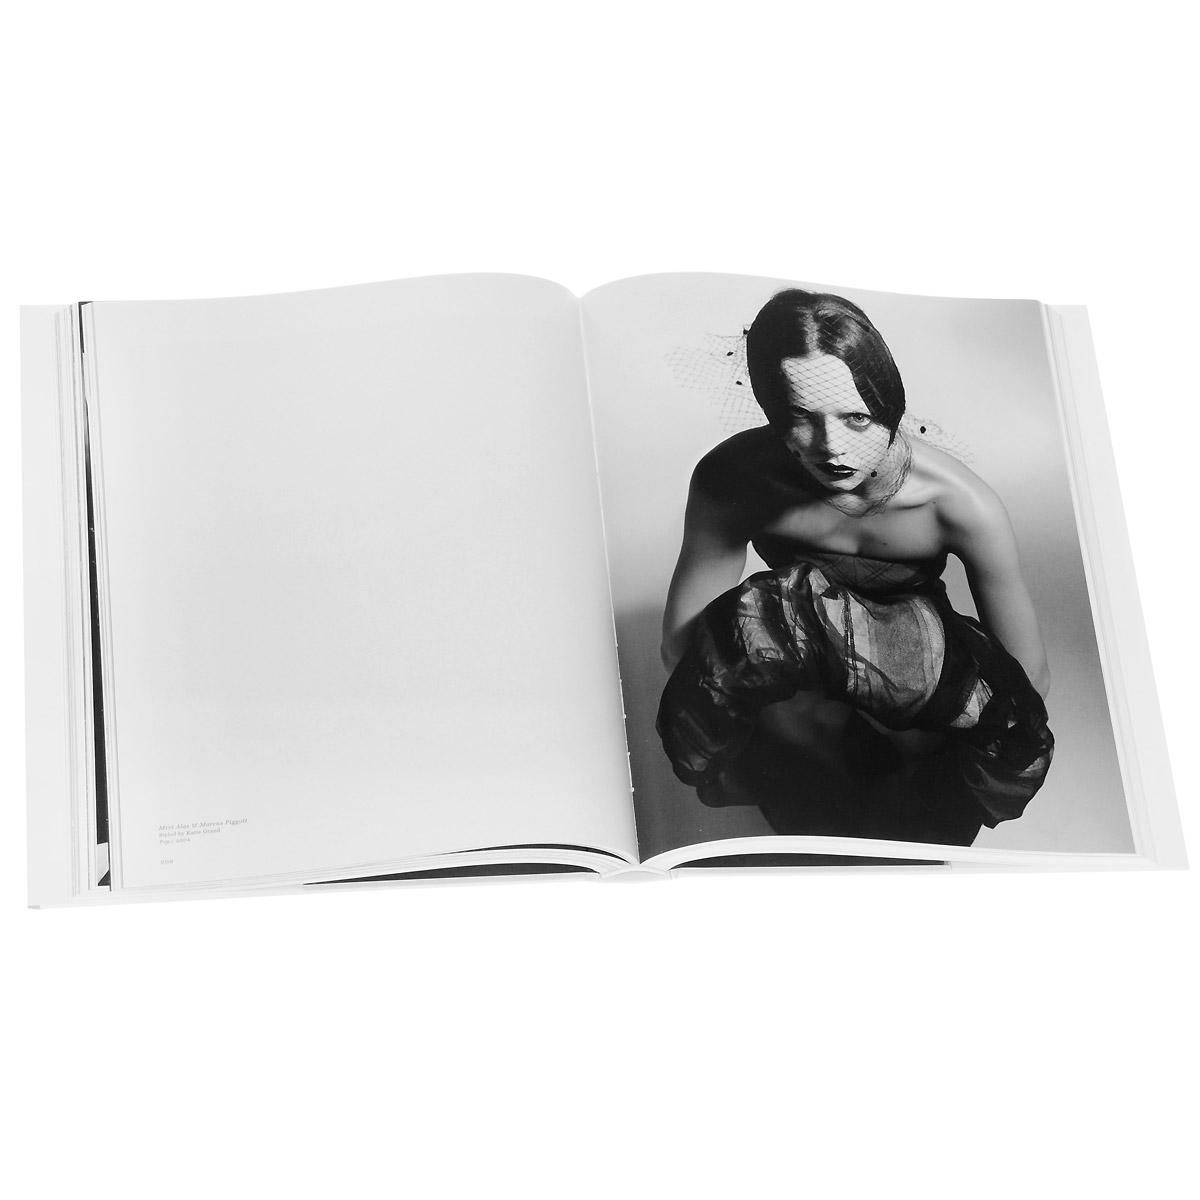 Louis Vuitton Fashion Photography